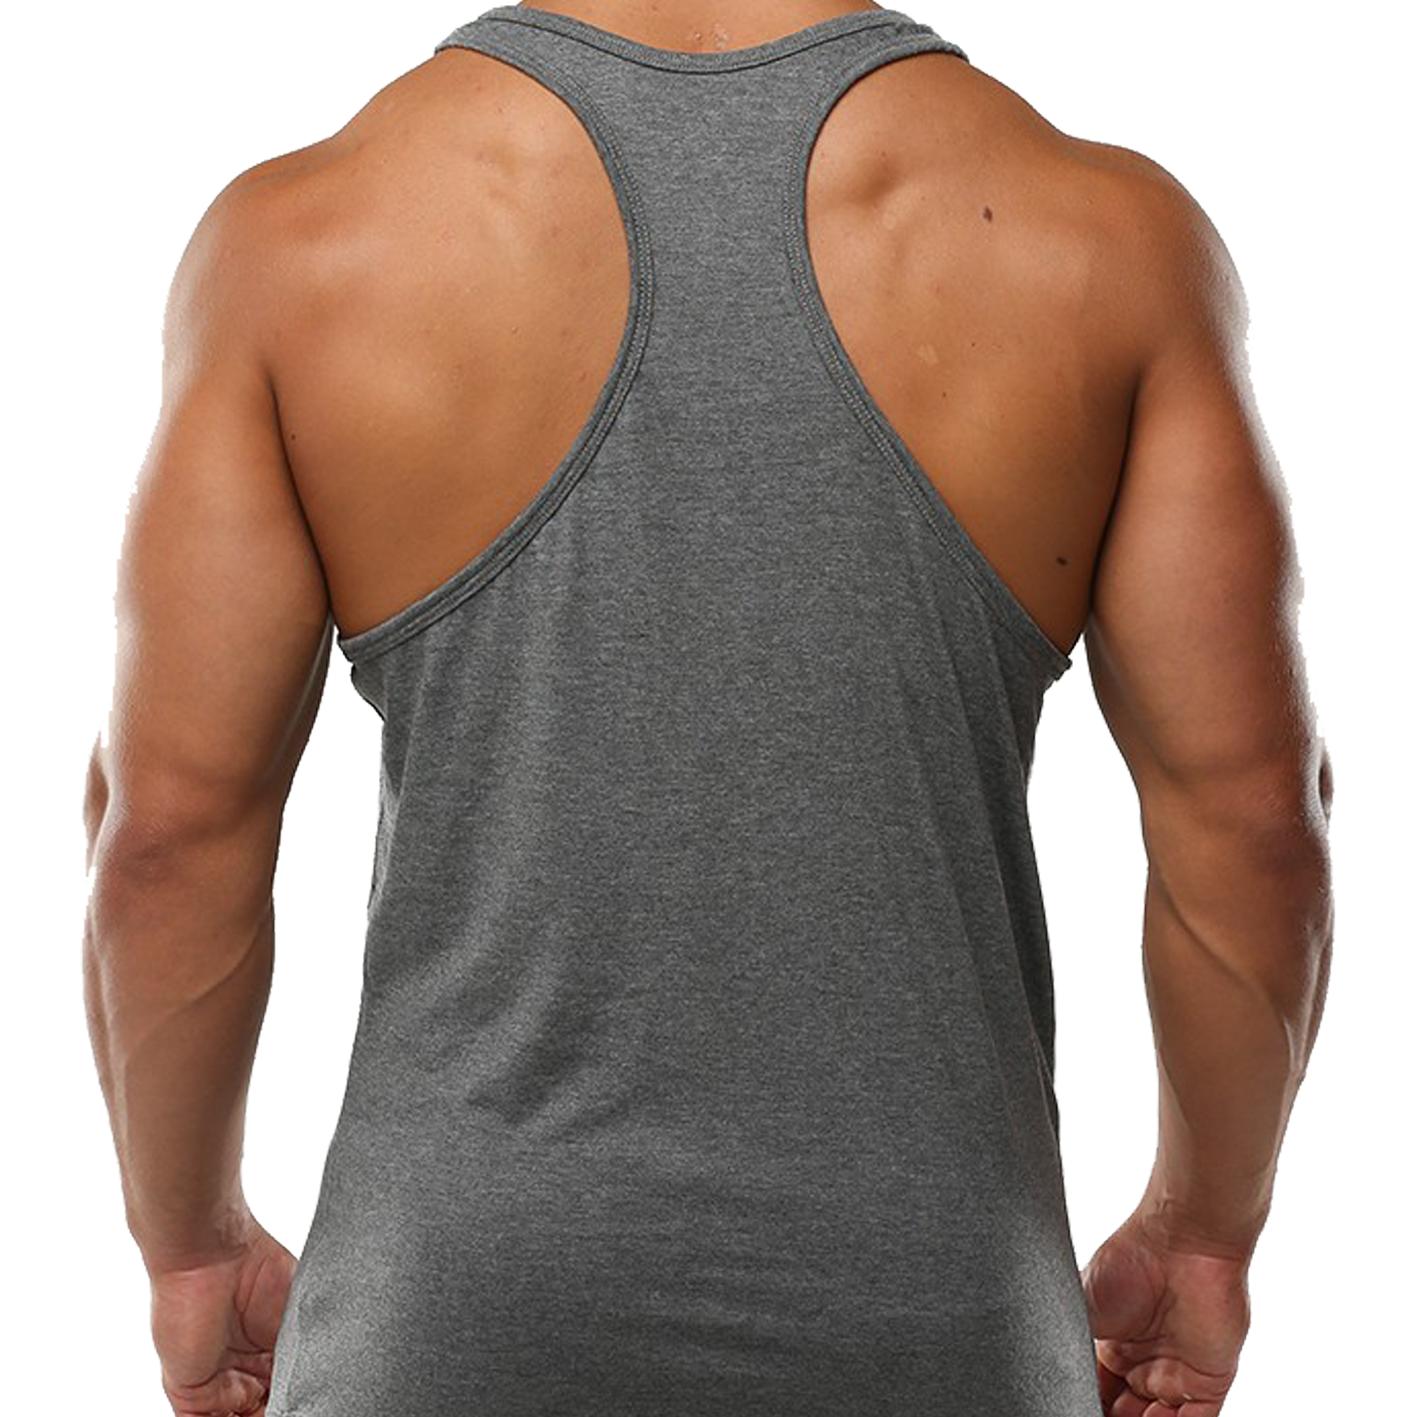 Mens Gym Vest Plain Stringer Bodybuilding Muscle Training Top Fitness Singlet 7